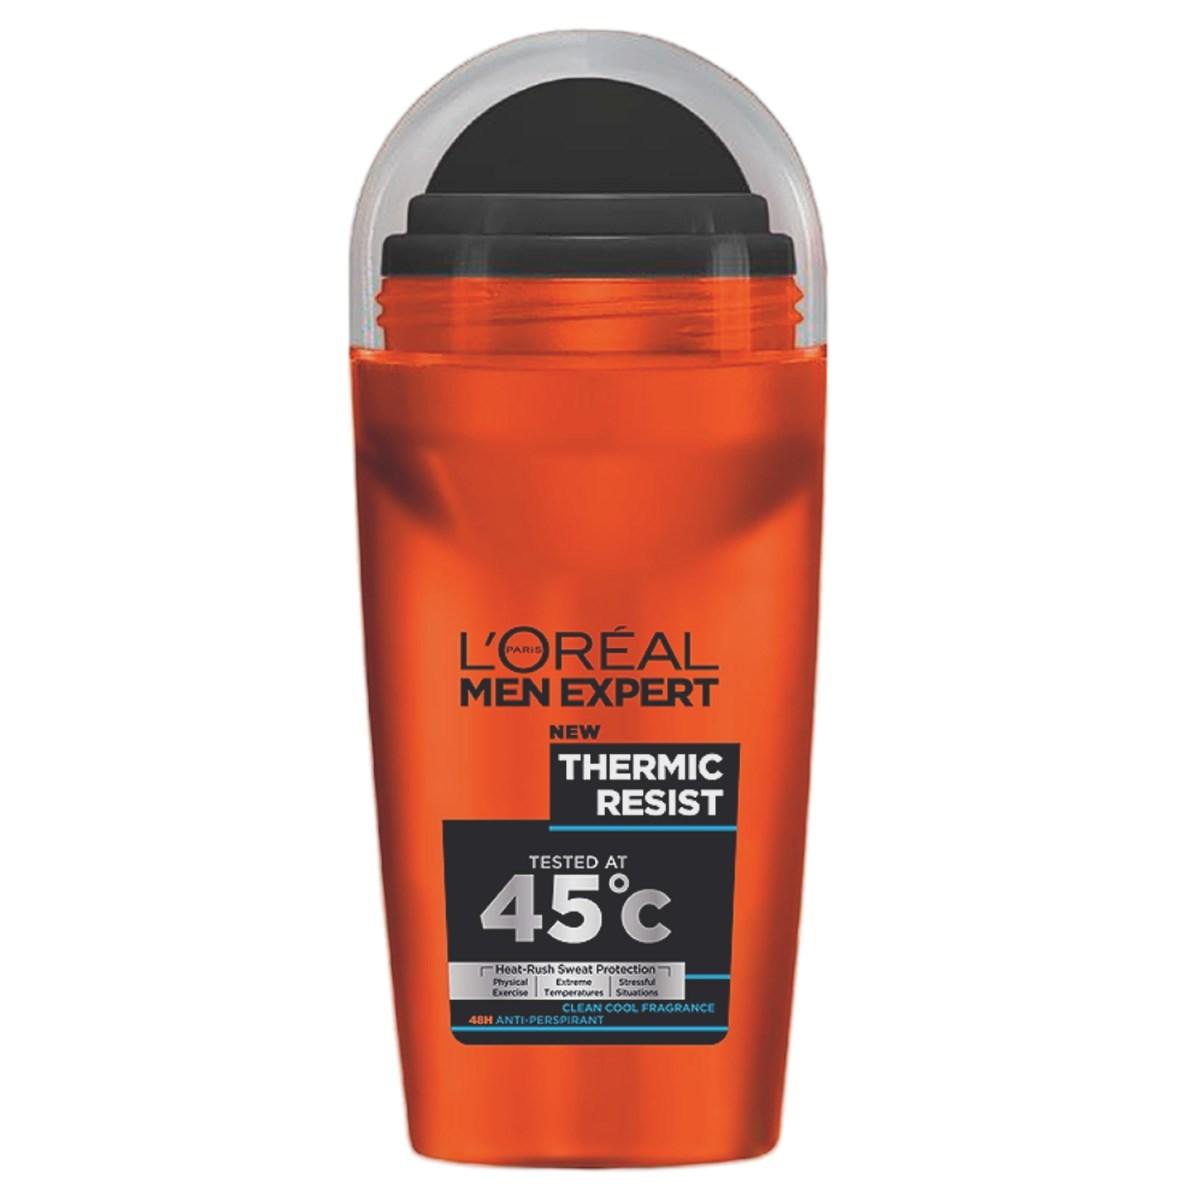 L'Oréal Paris Men Expert Thermic Resist 45°C Deodorant Roll-On